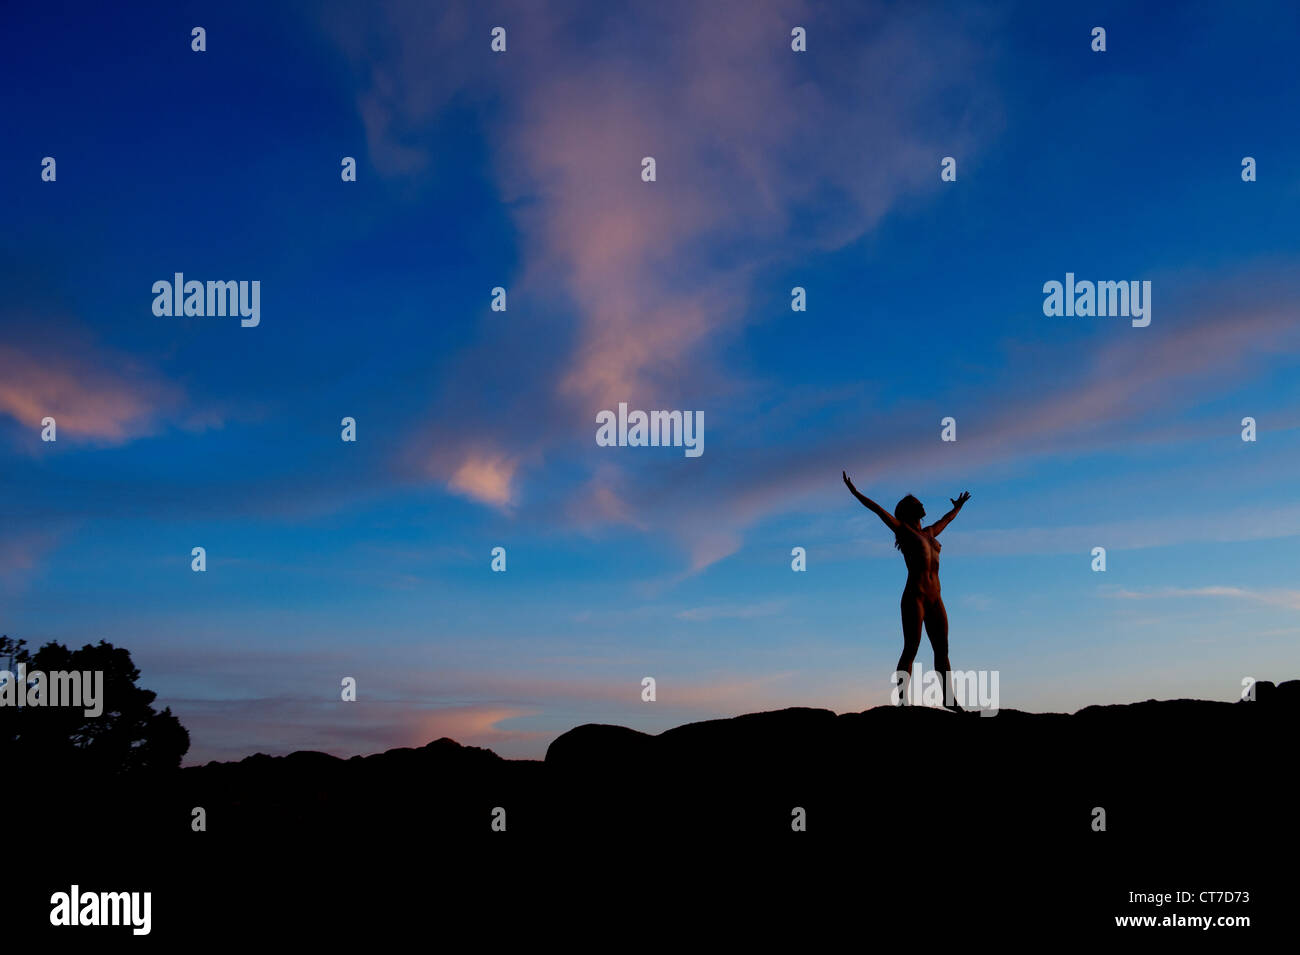 Junge Frau in Wüste mit Armen offen, silhouette Stockbild